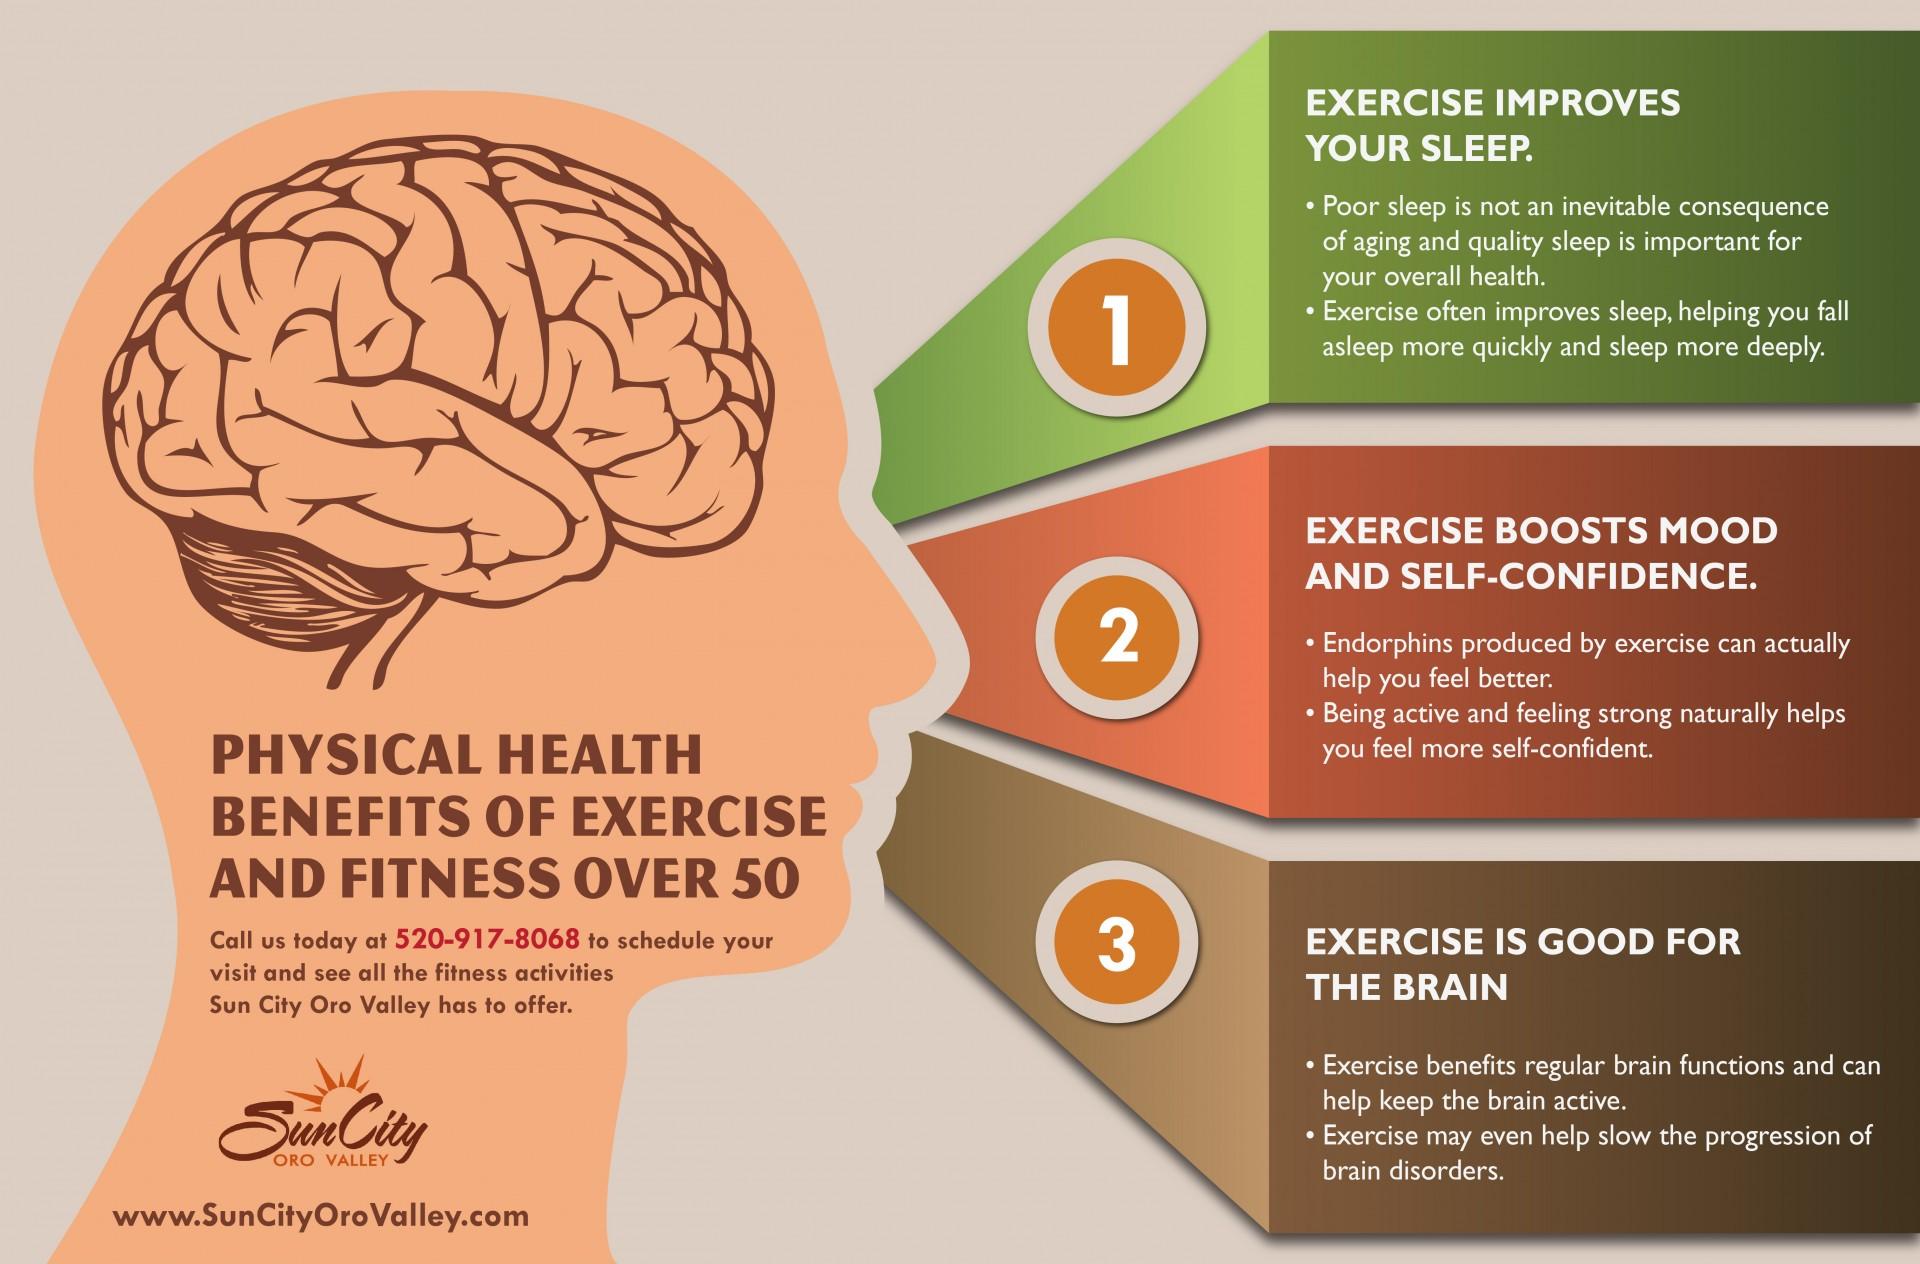 018 D6d3a911e0230557d9d5f7b44d226c88 Full Essay On Sleep And Good Health Fascinating 1920